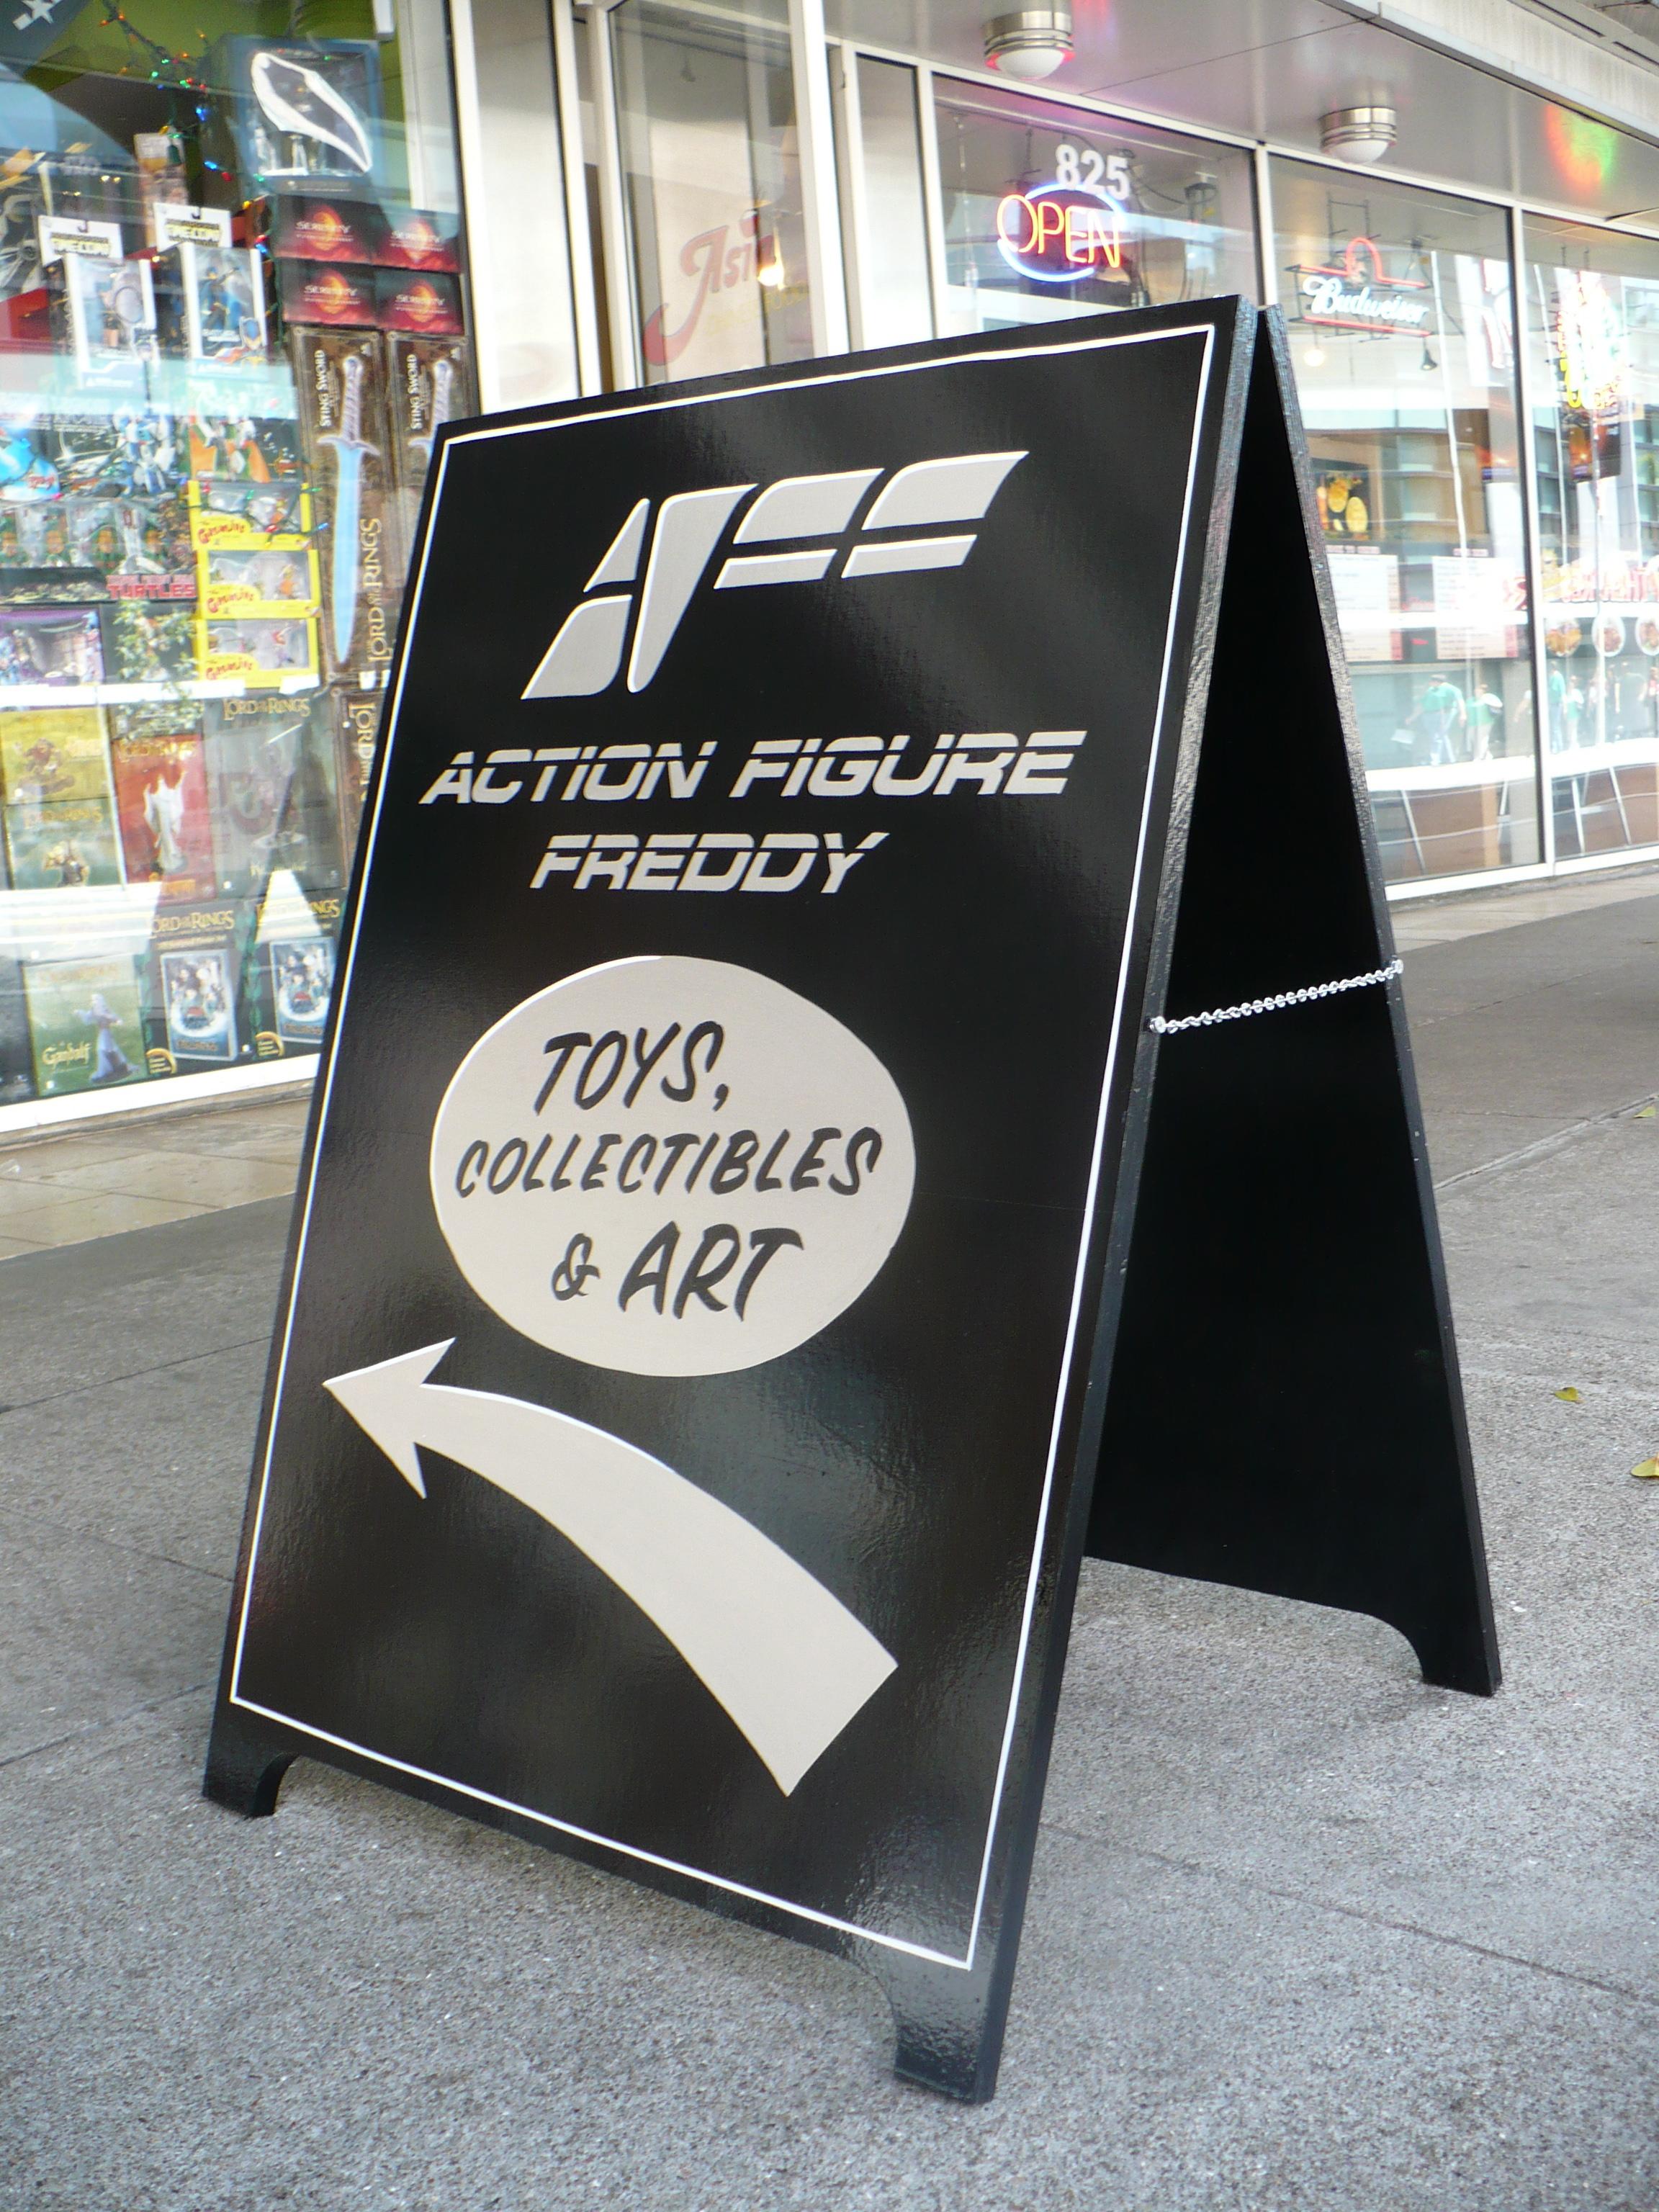 A-FRAME-action-figure-freddy_3131069385_o.jpg